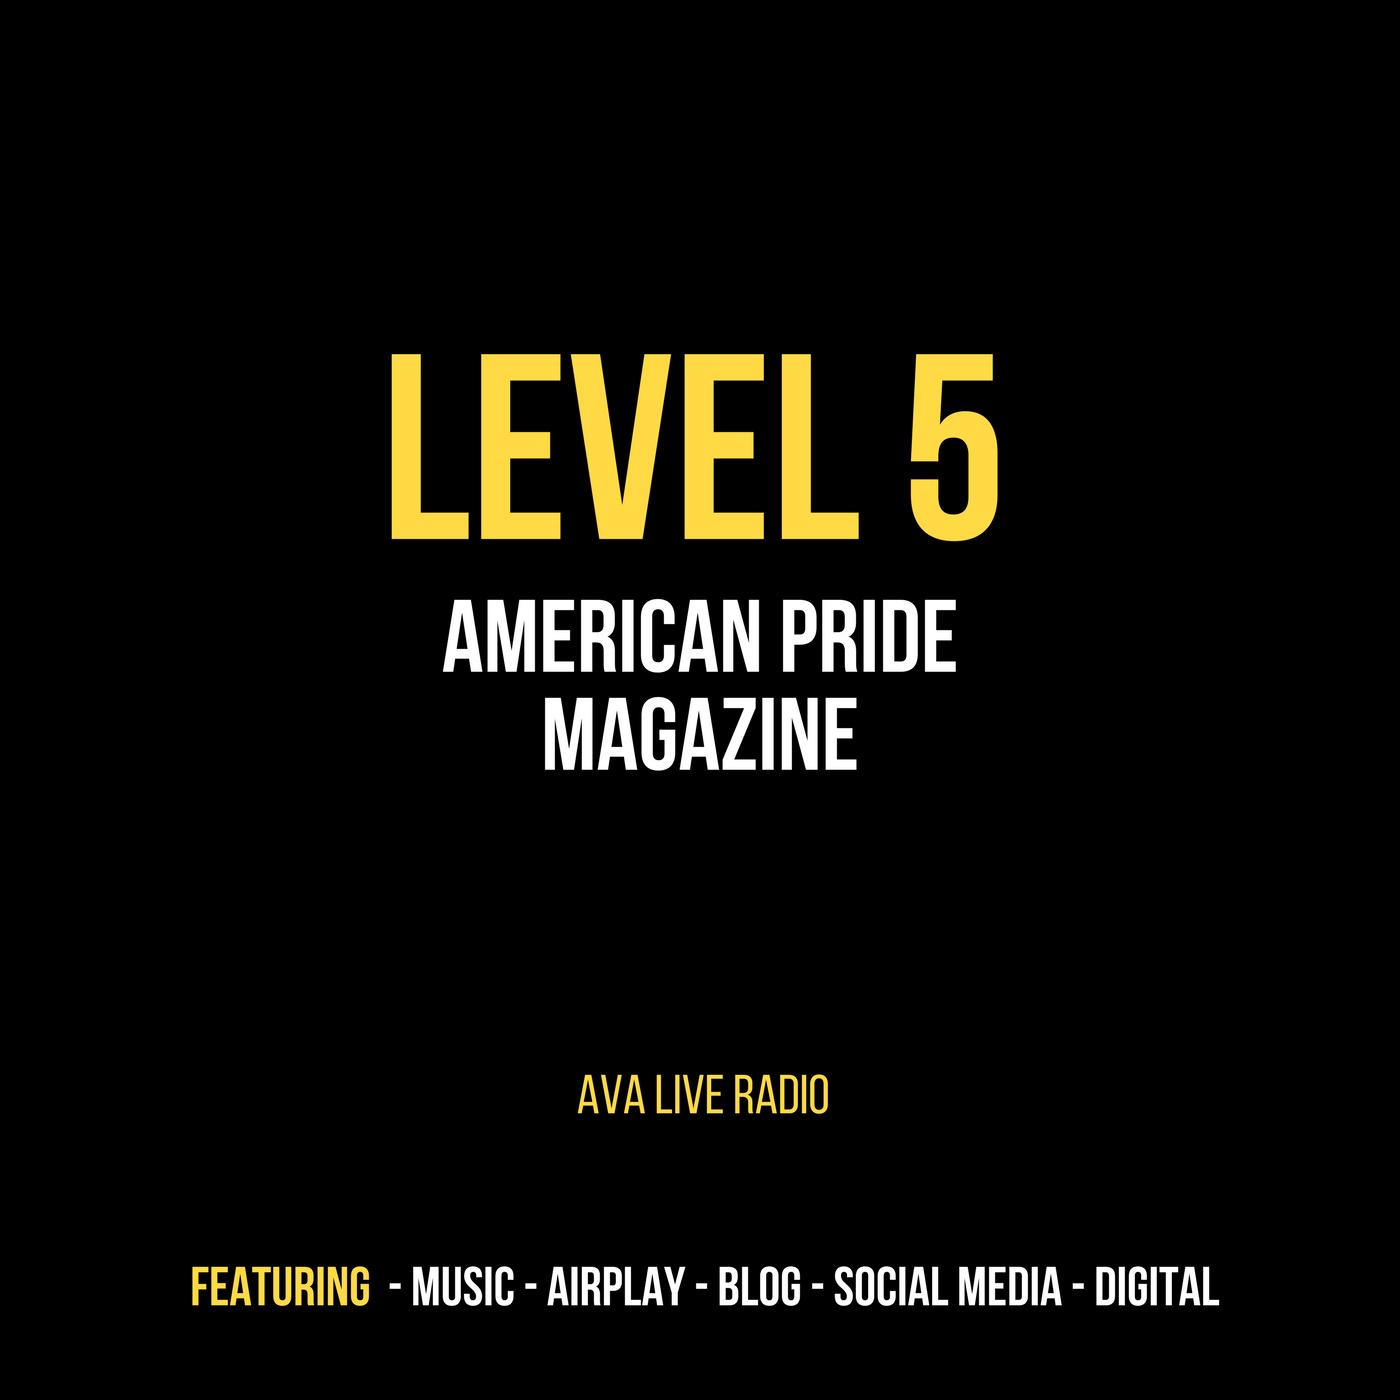 LEVEL 5 avaliveradio.png